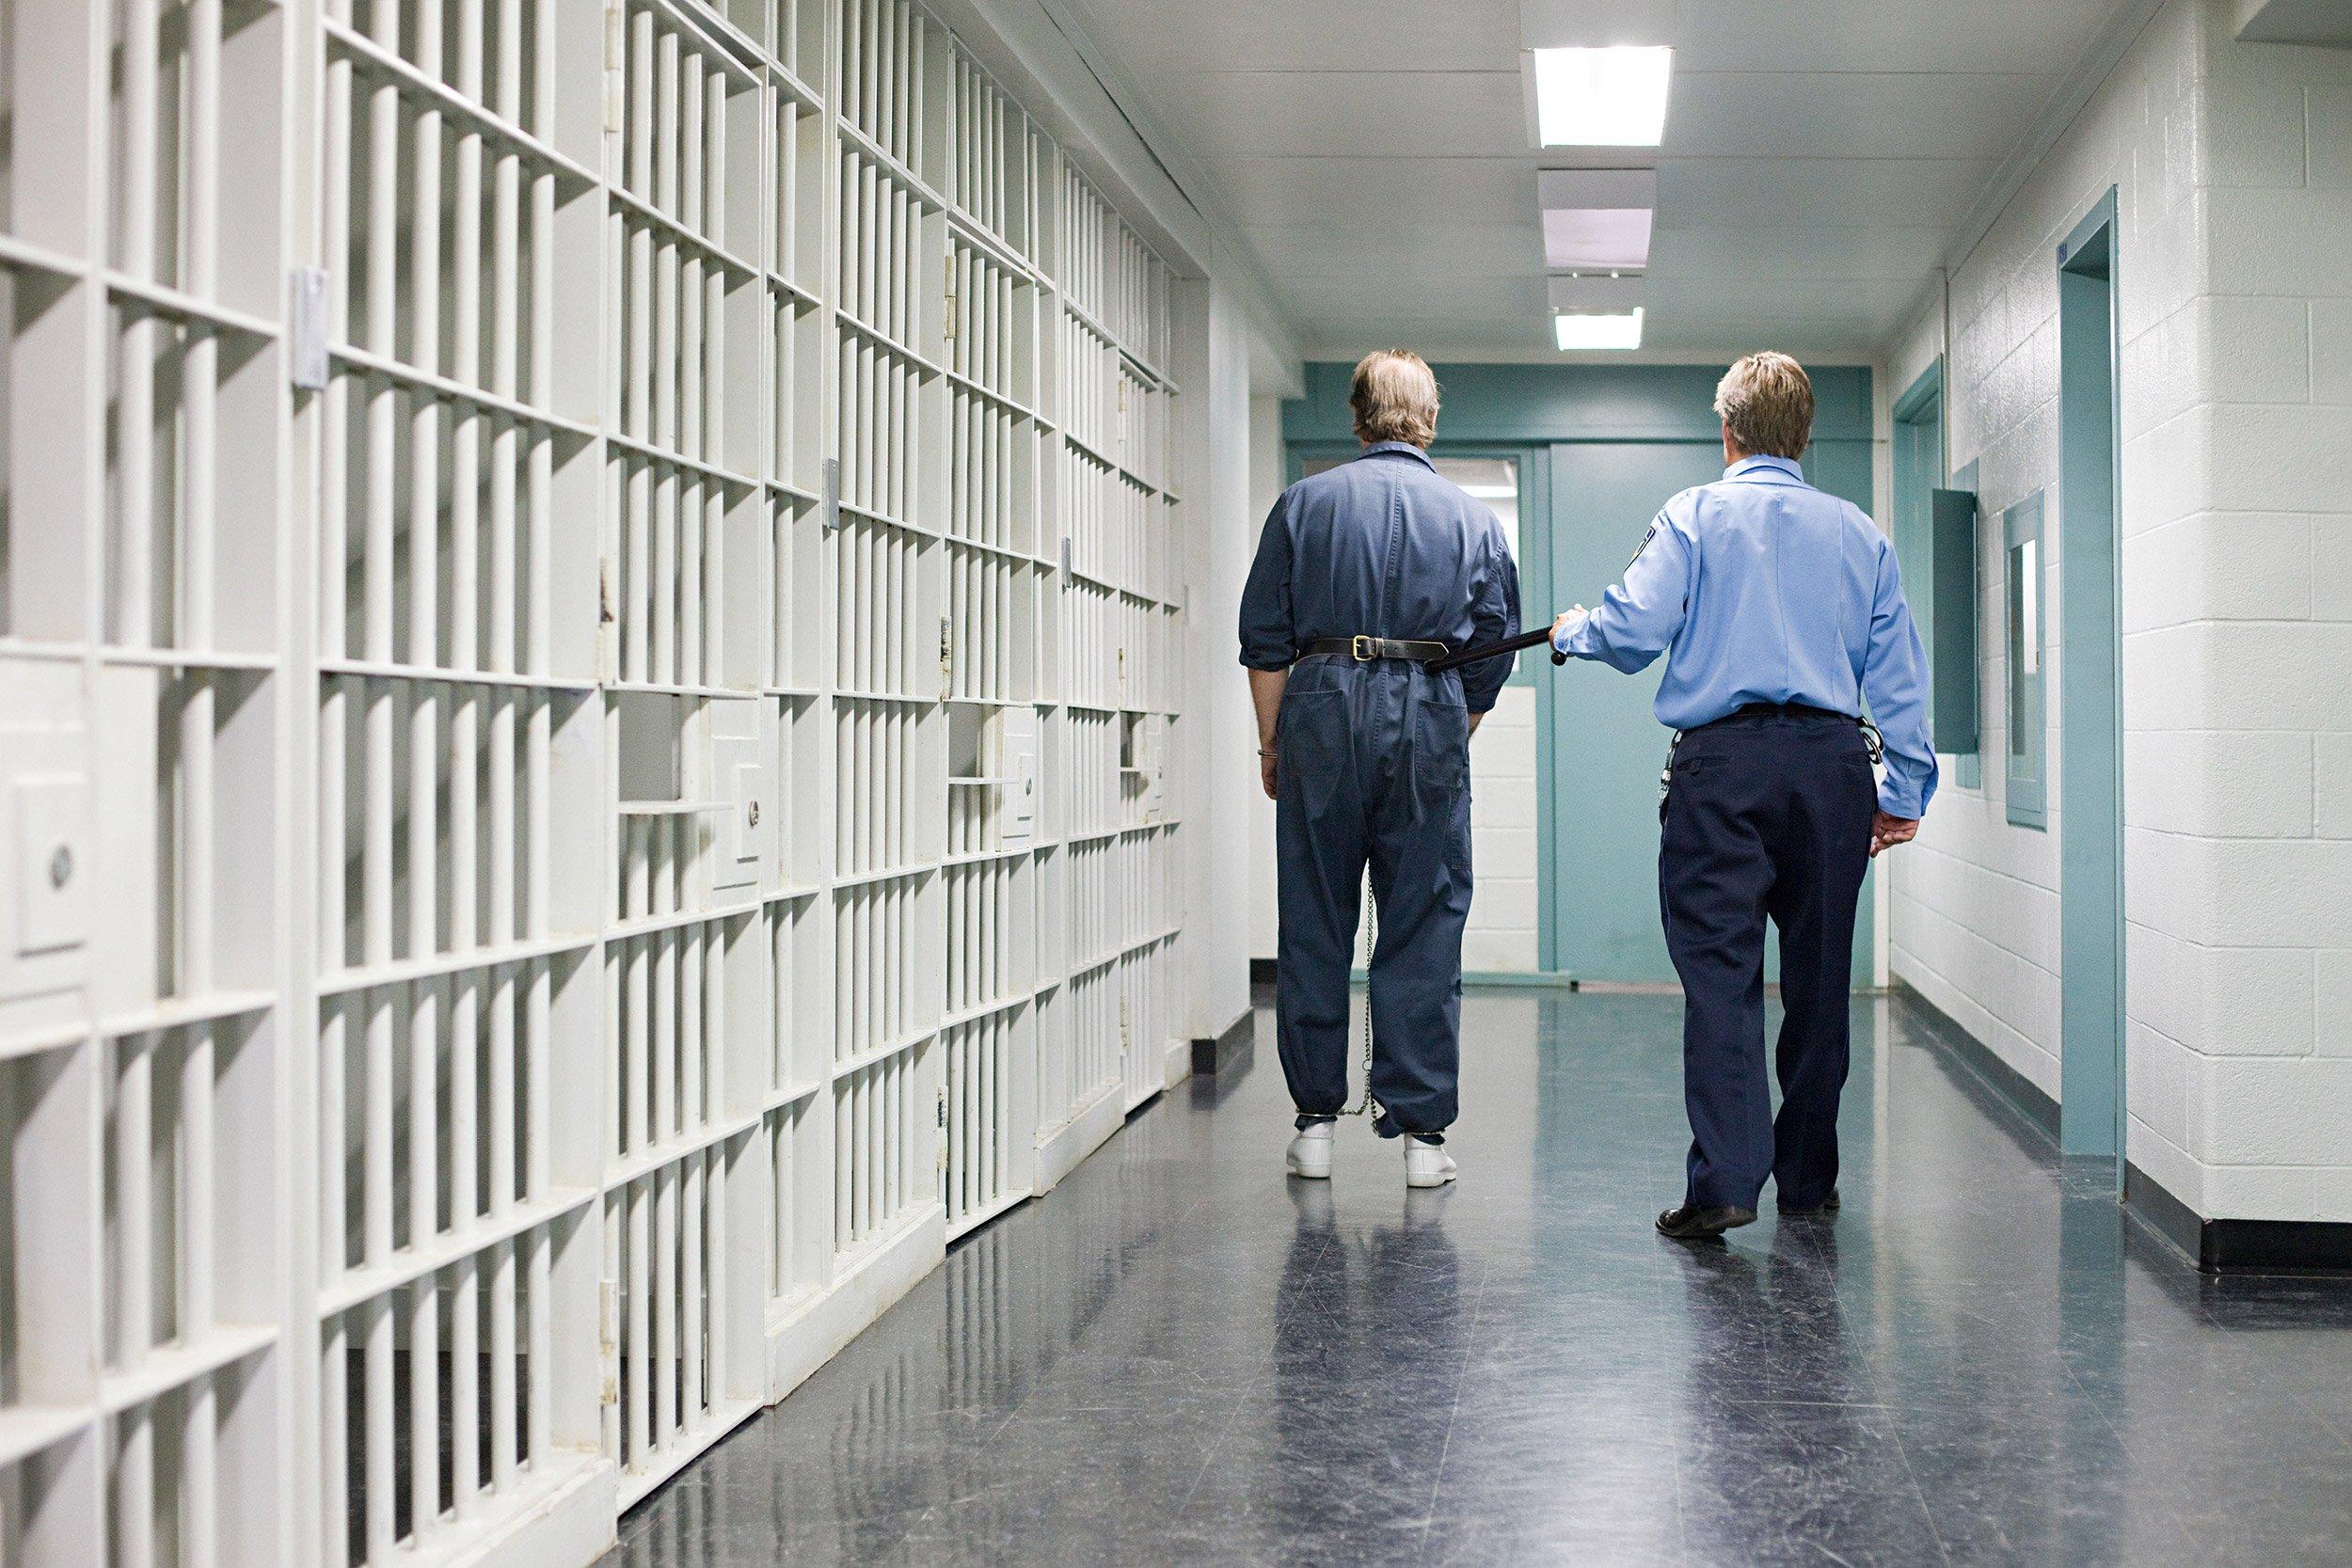 06_18_PrisonRape_01